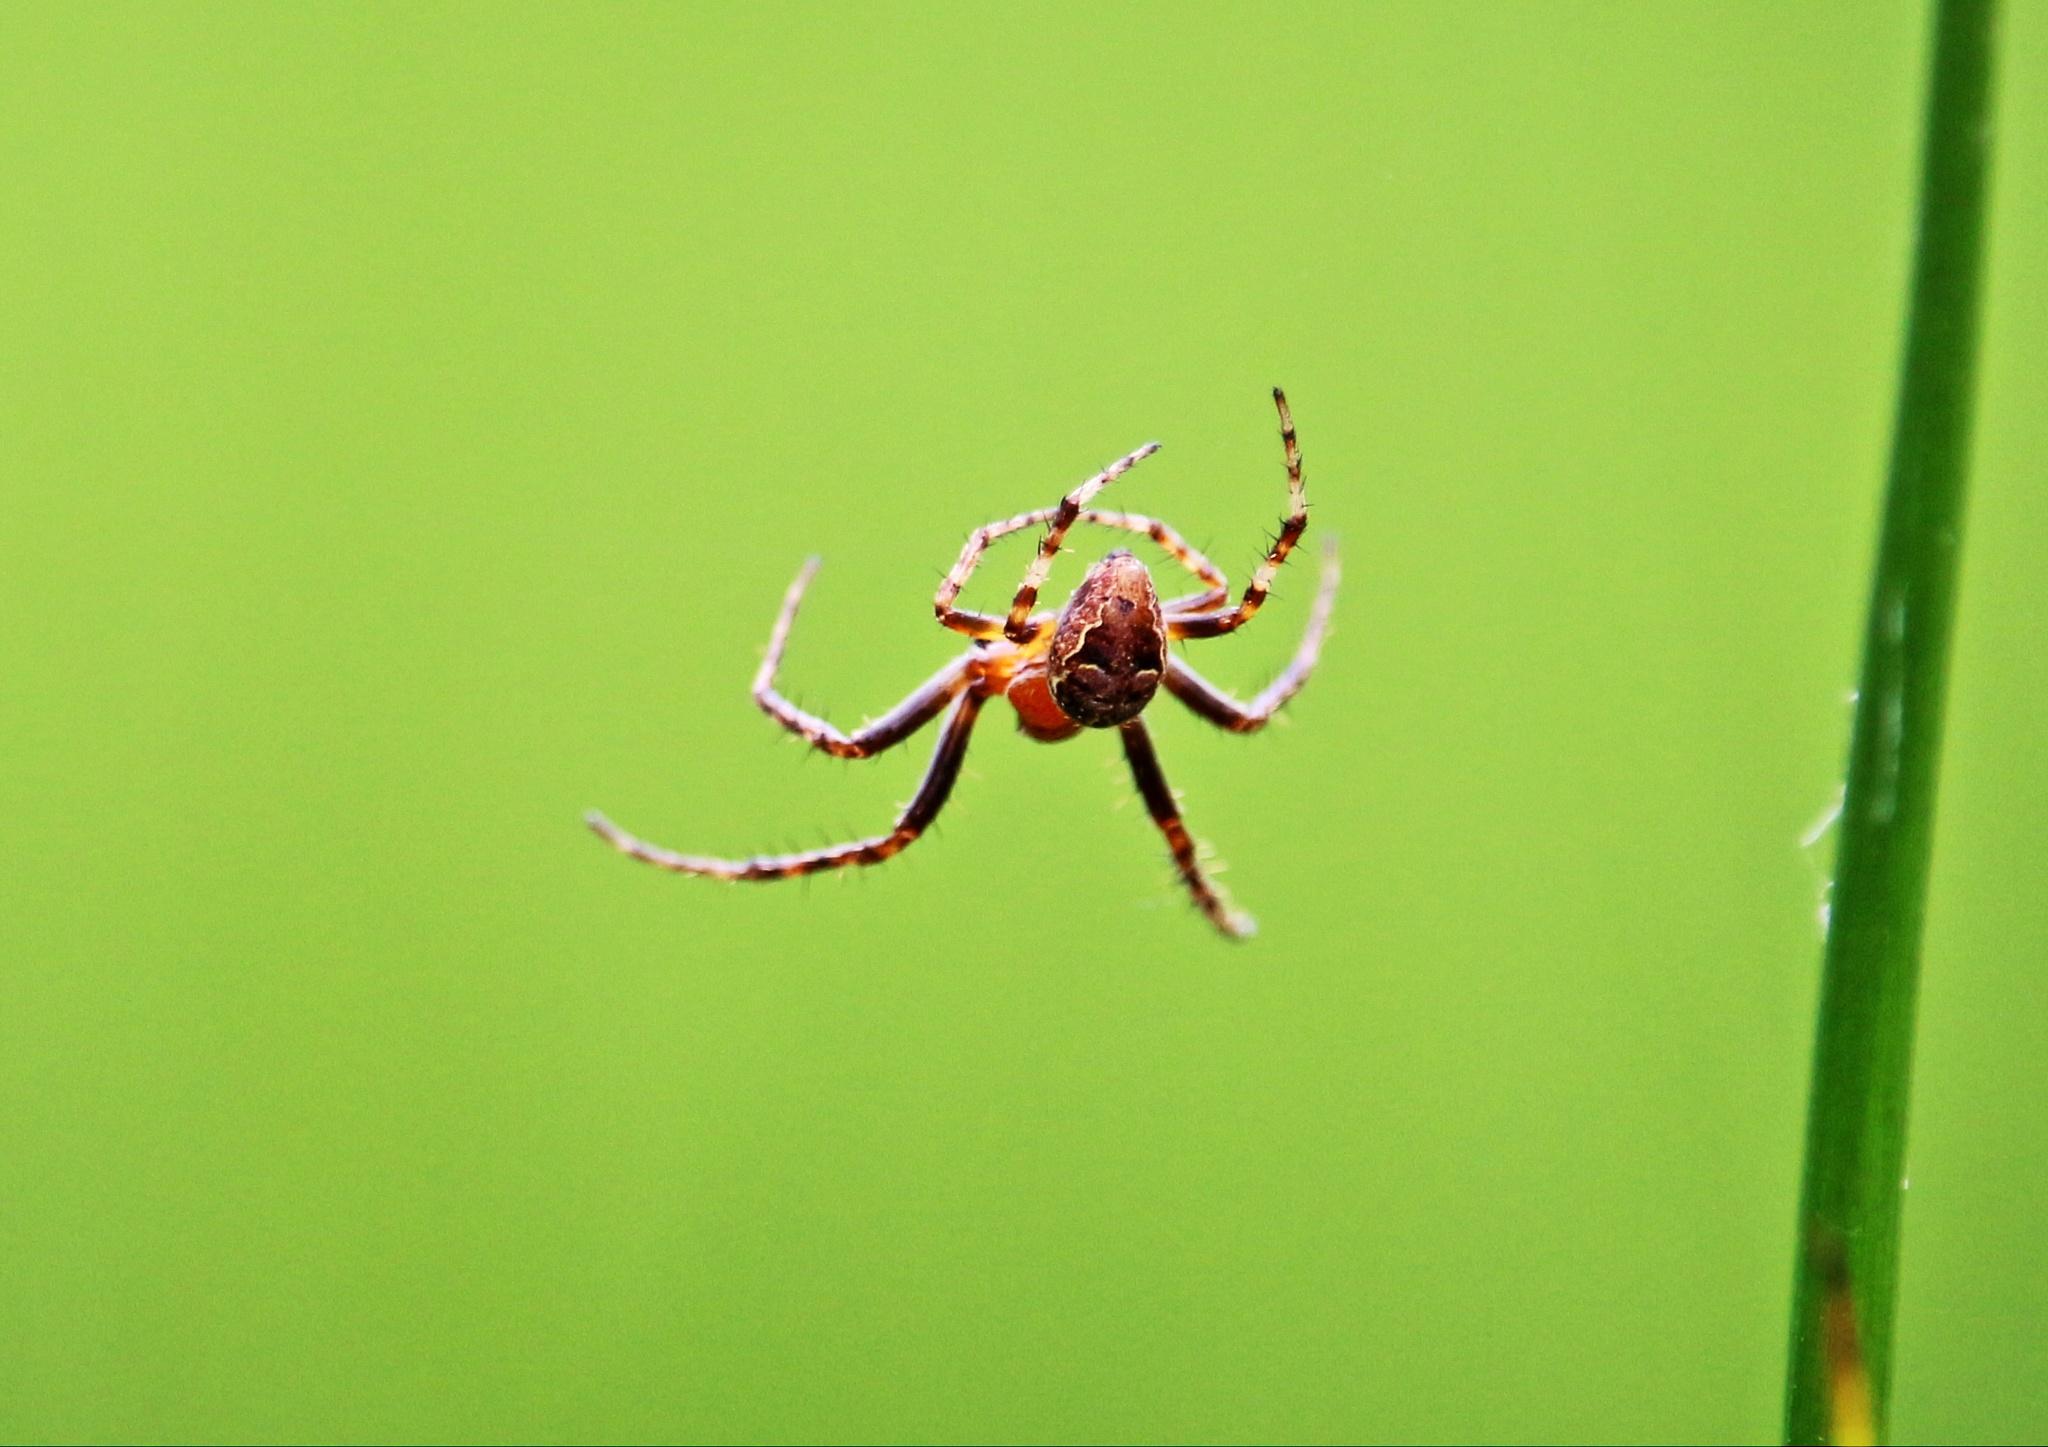 Flying spider, rietkruisspin by Evie Tinnevelt